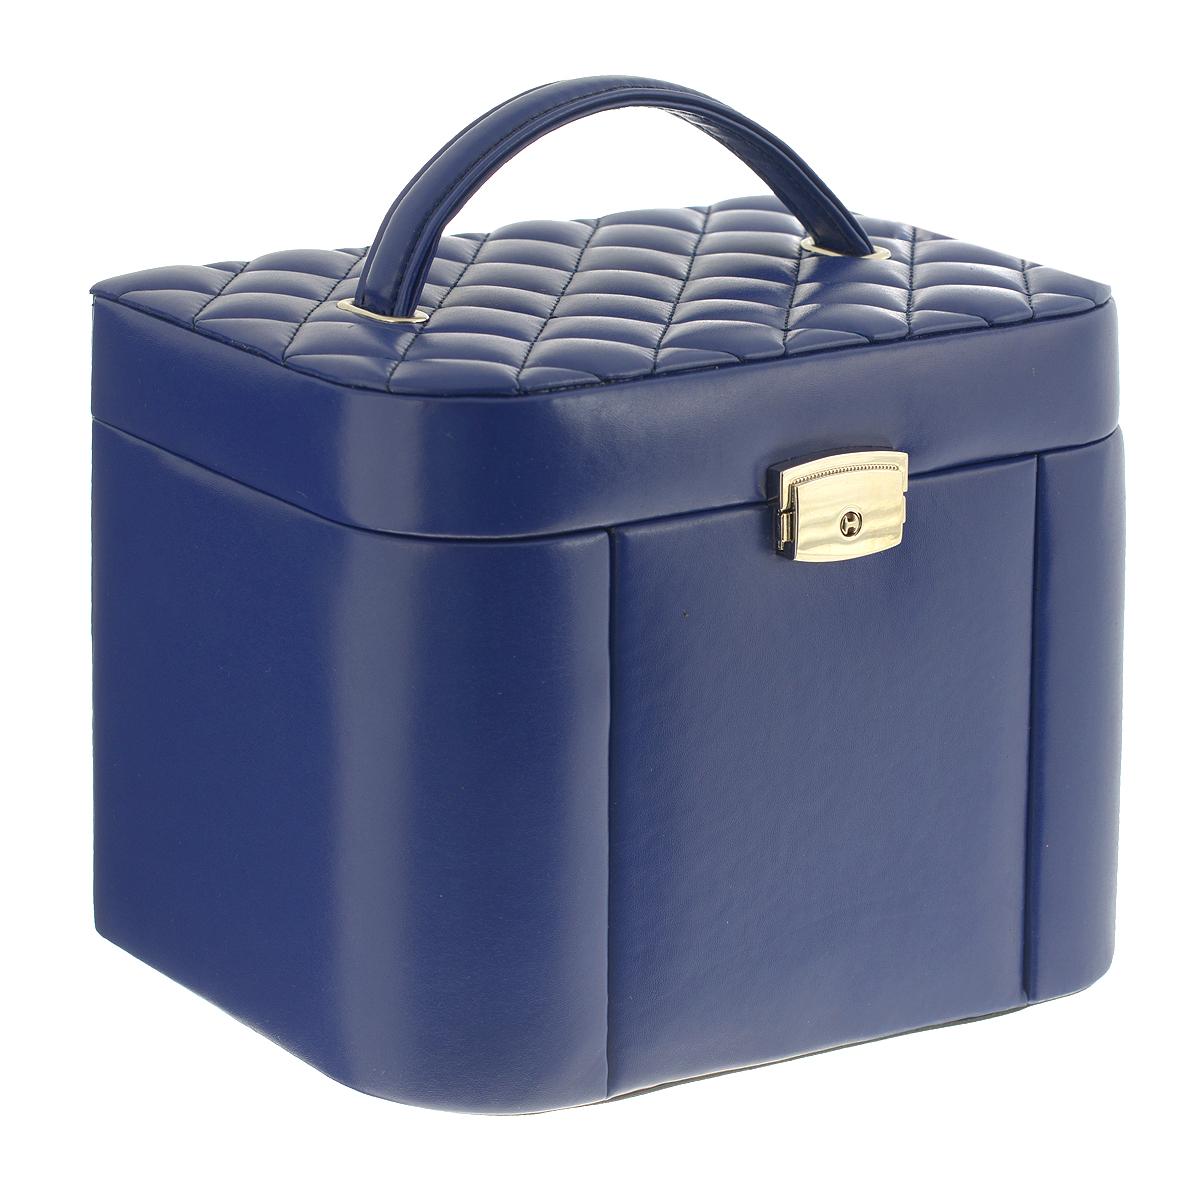 Graceful Rhythm lndustrial Co. Ltd Шкатулка для украшений, цвет: синий JB-01952